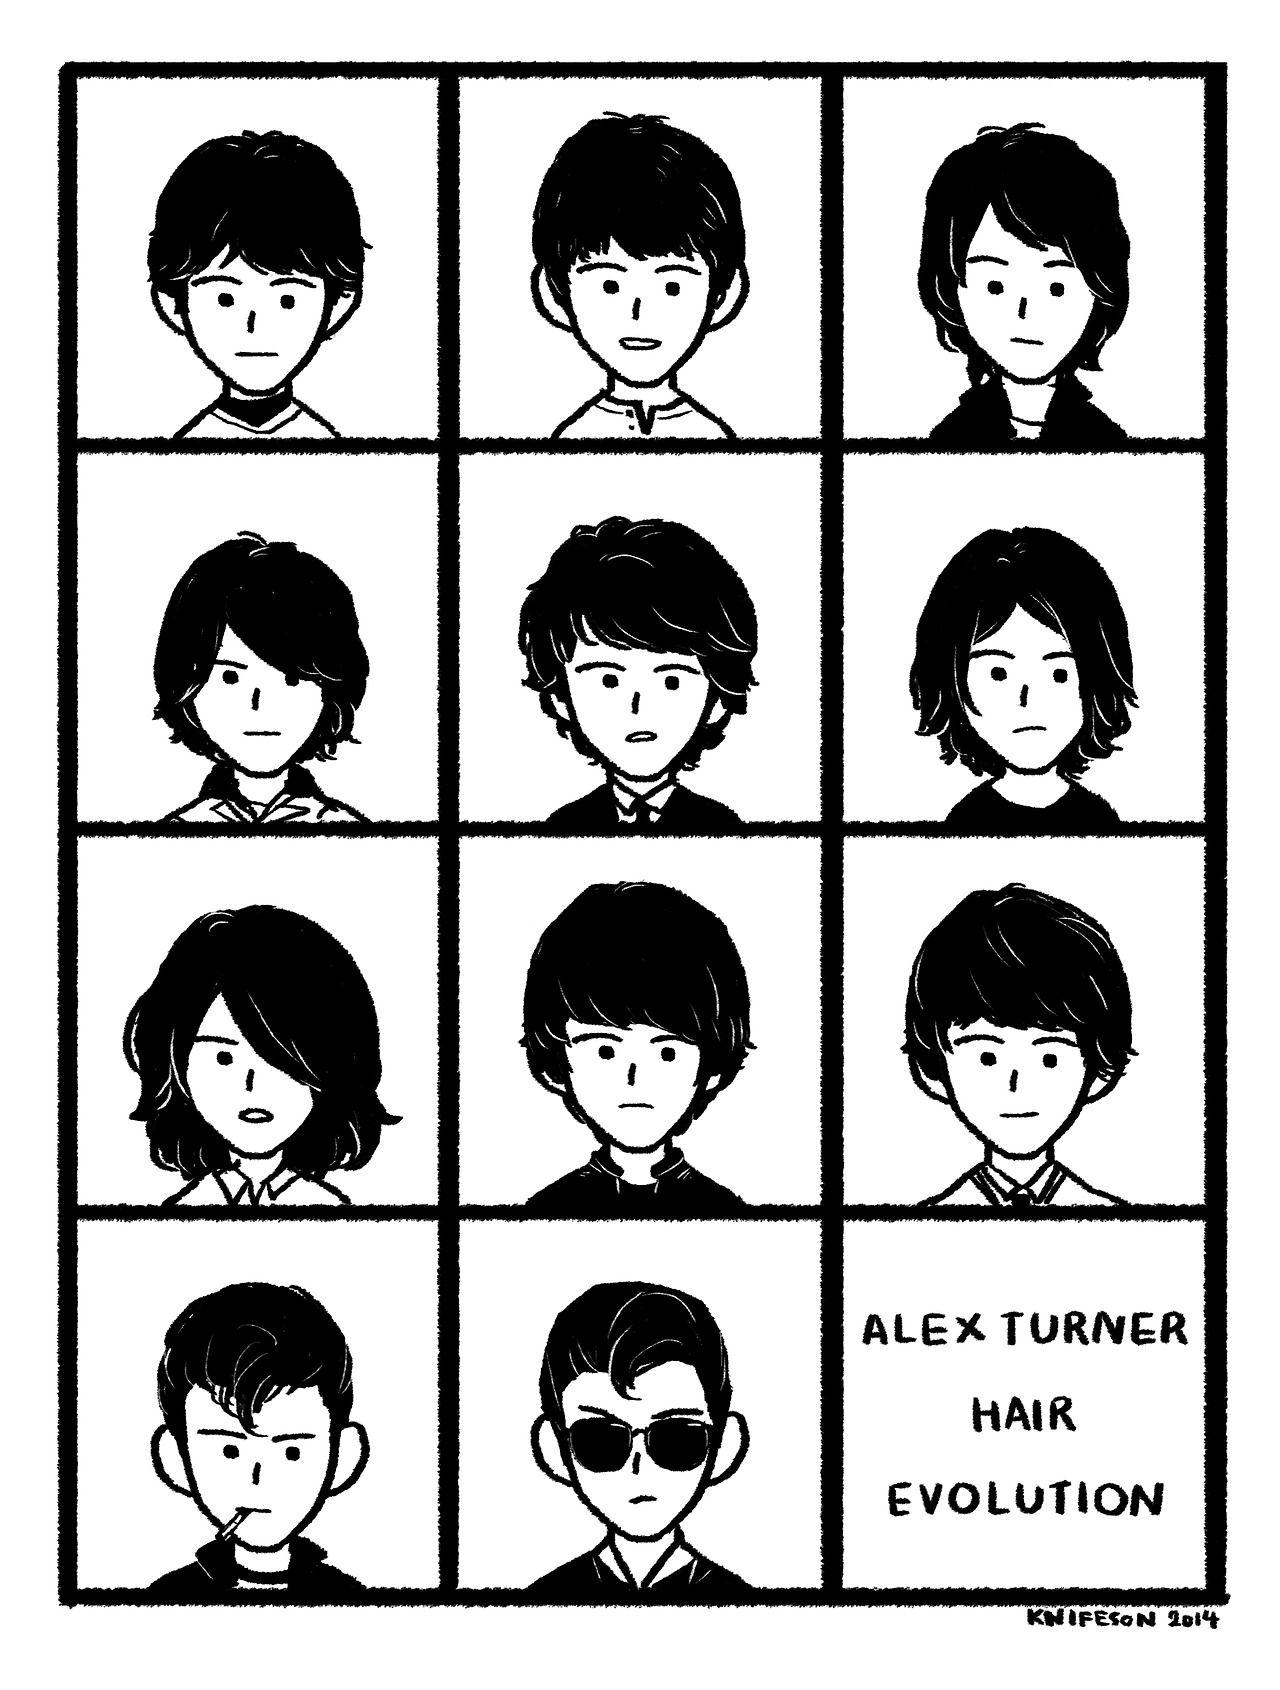 Hair Evolution Arctic Monkeys Artic Monkeys The Last Shadow Puppets